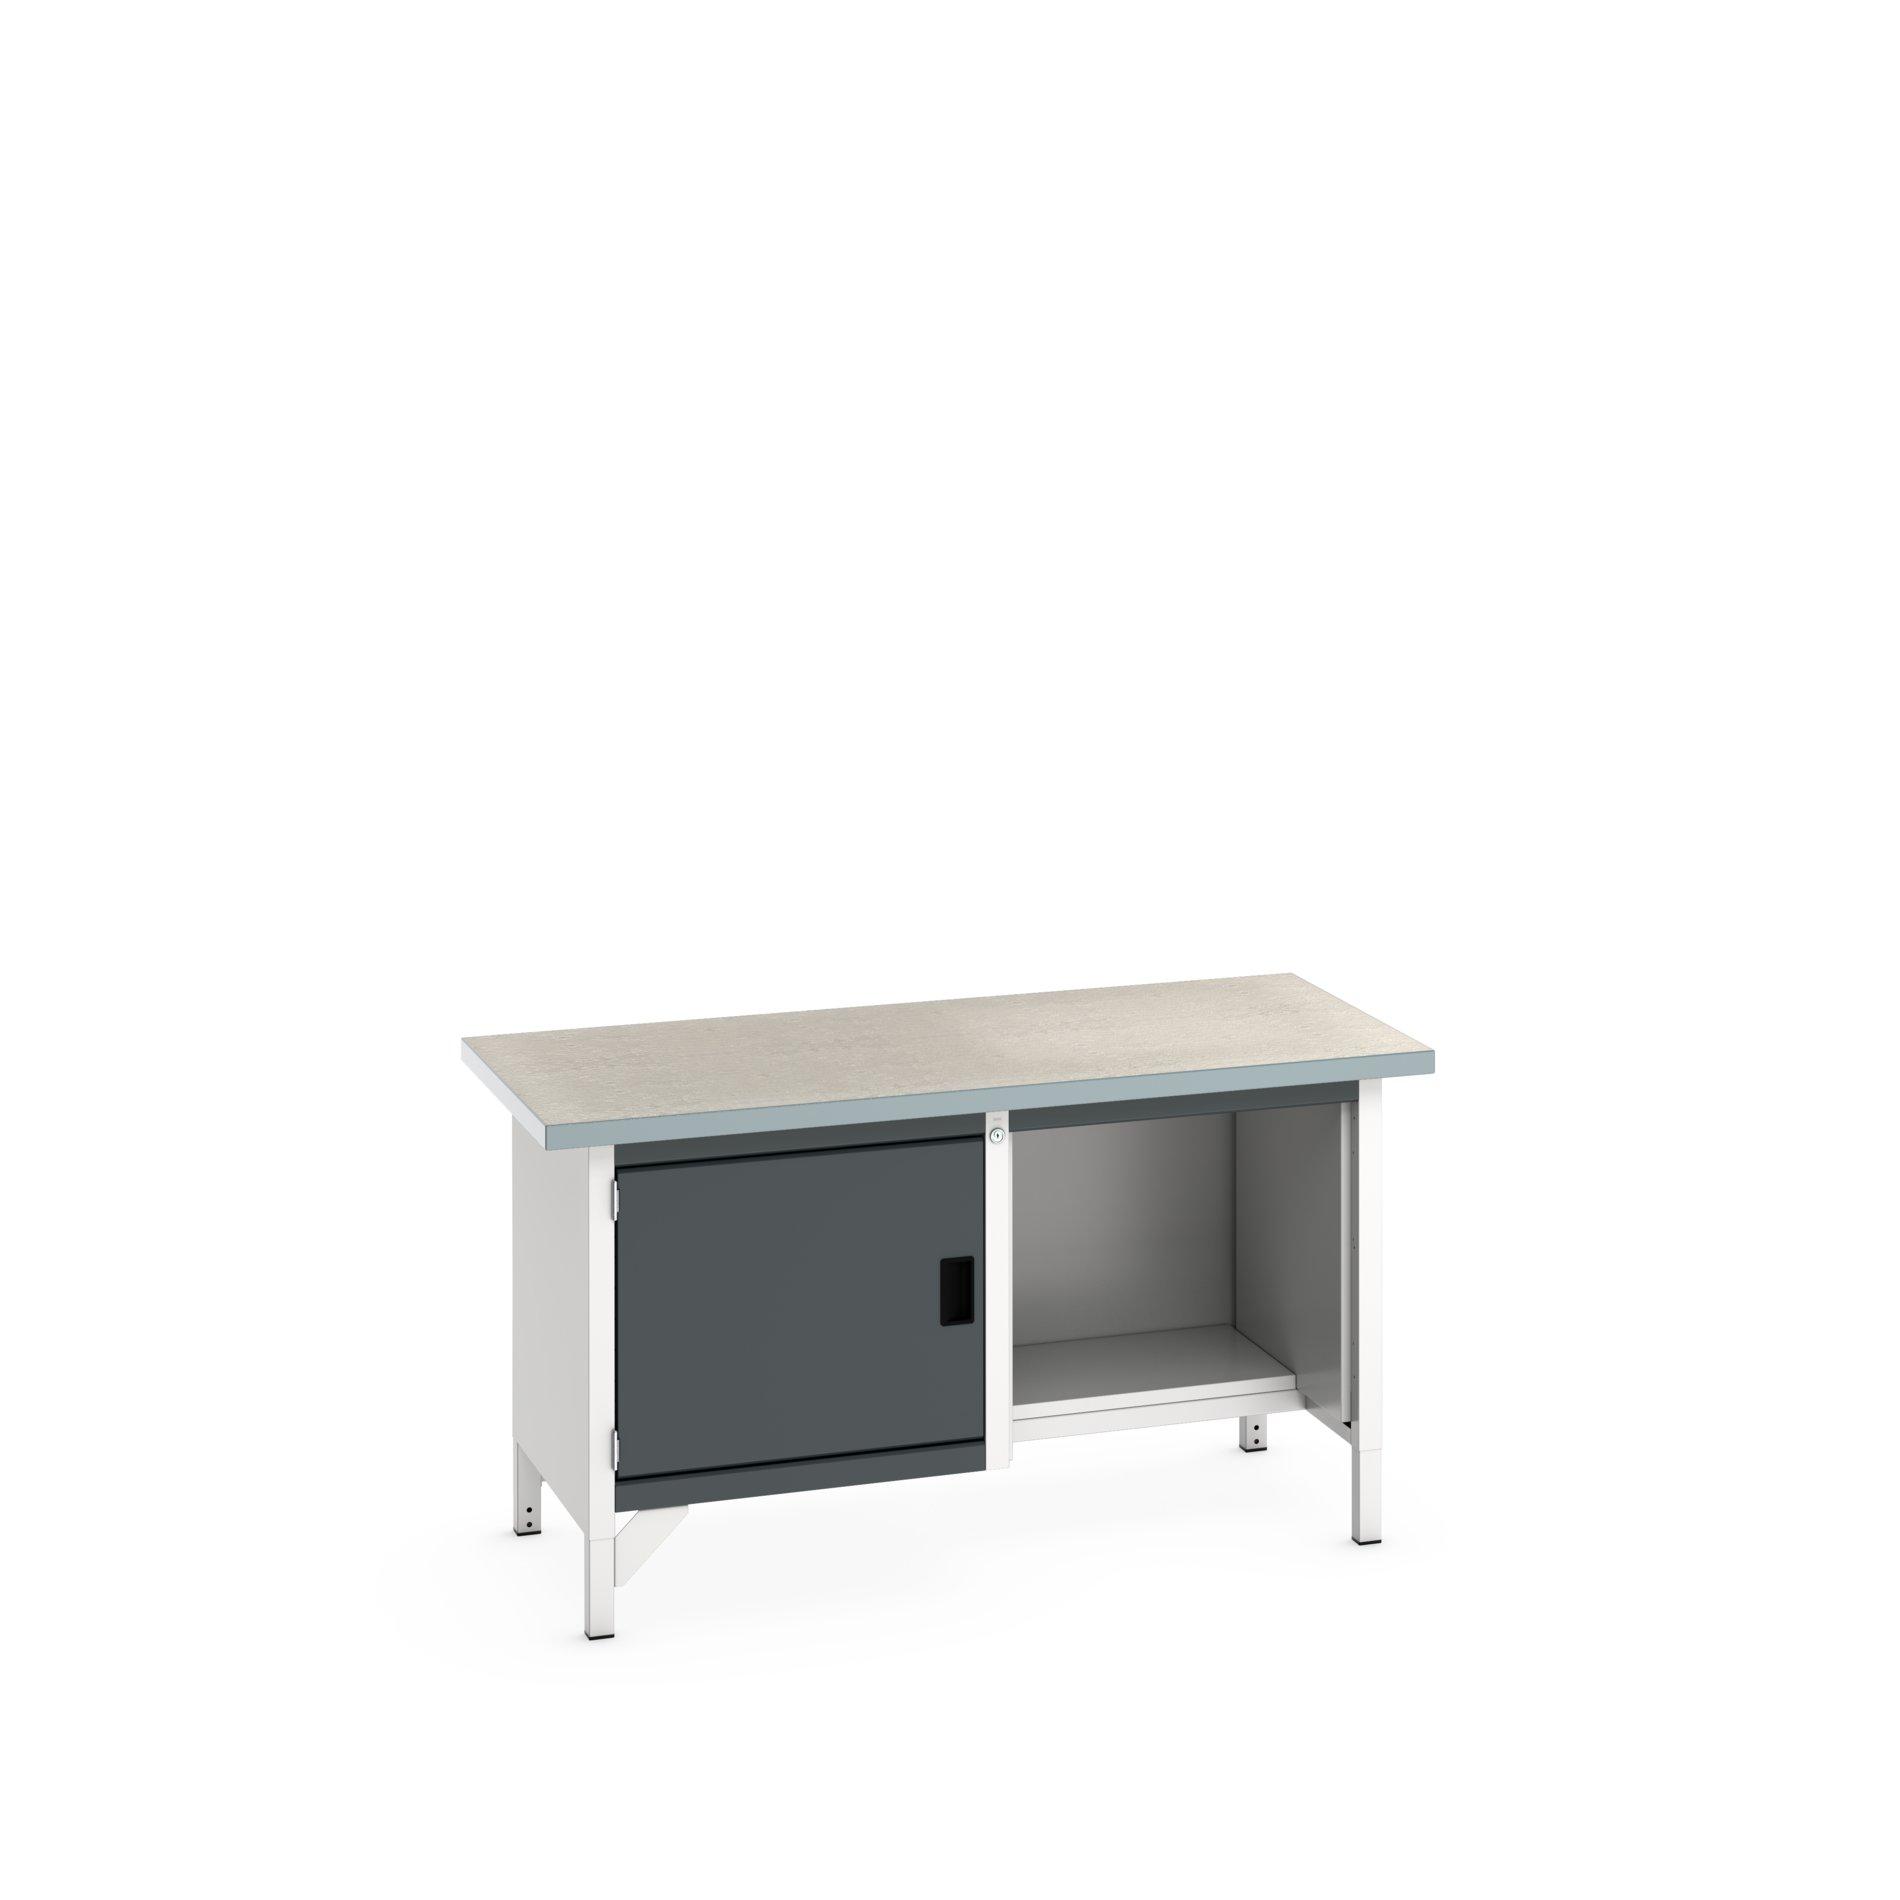 Bott Cubio Storage Bench With Full Cupboard / Open With Half Depth Base Shelf